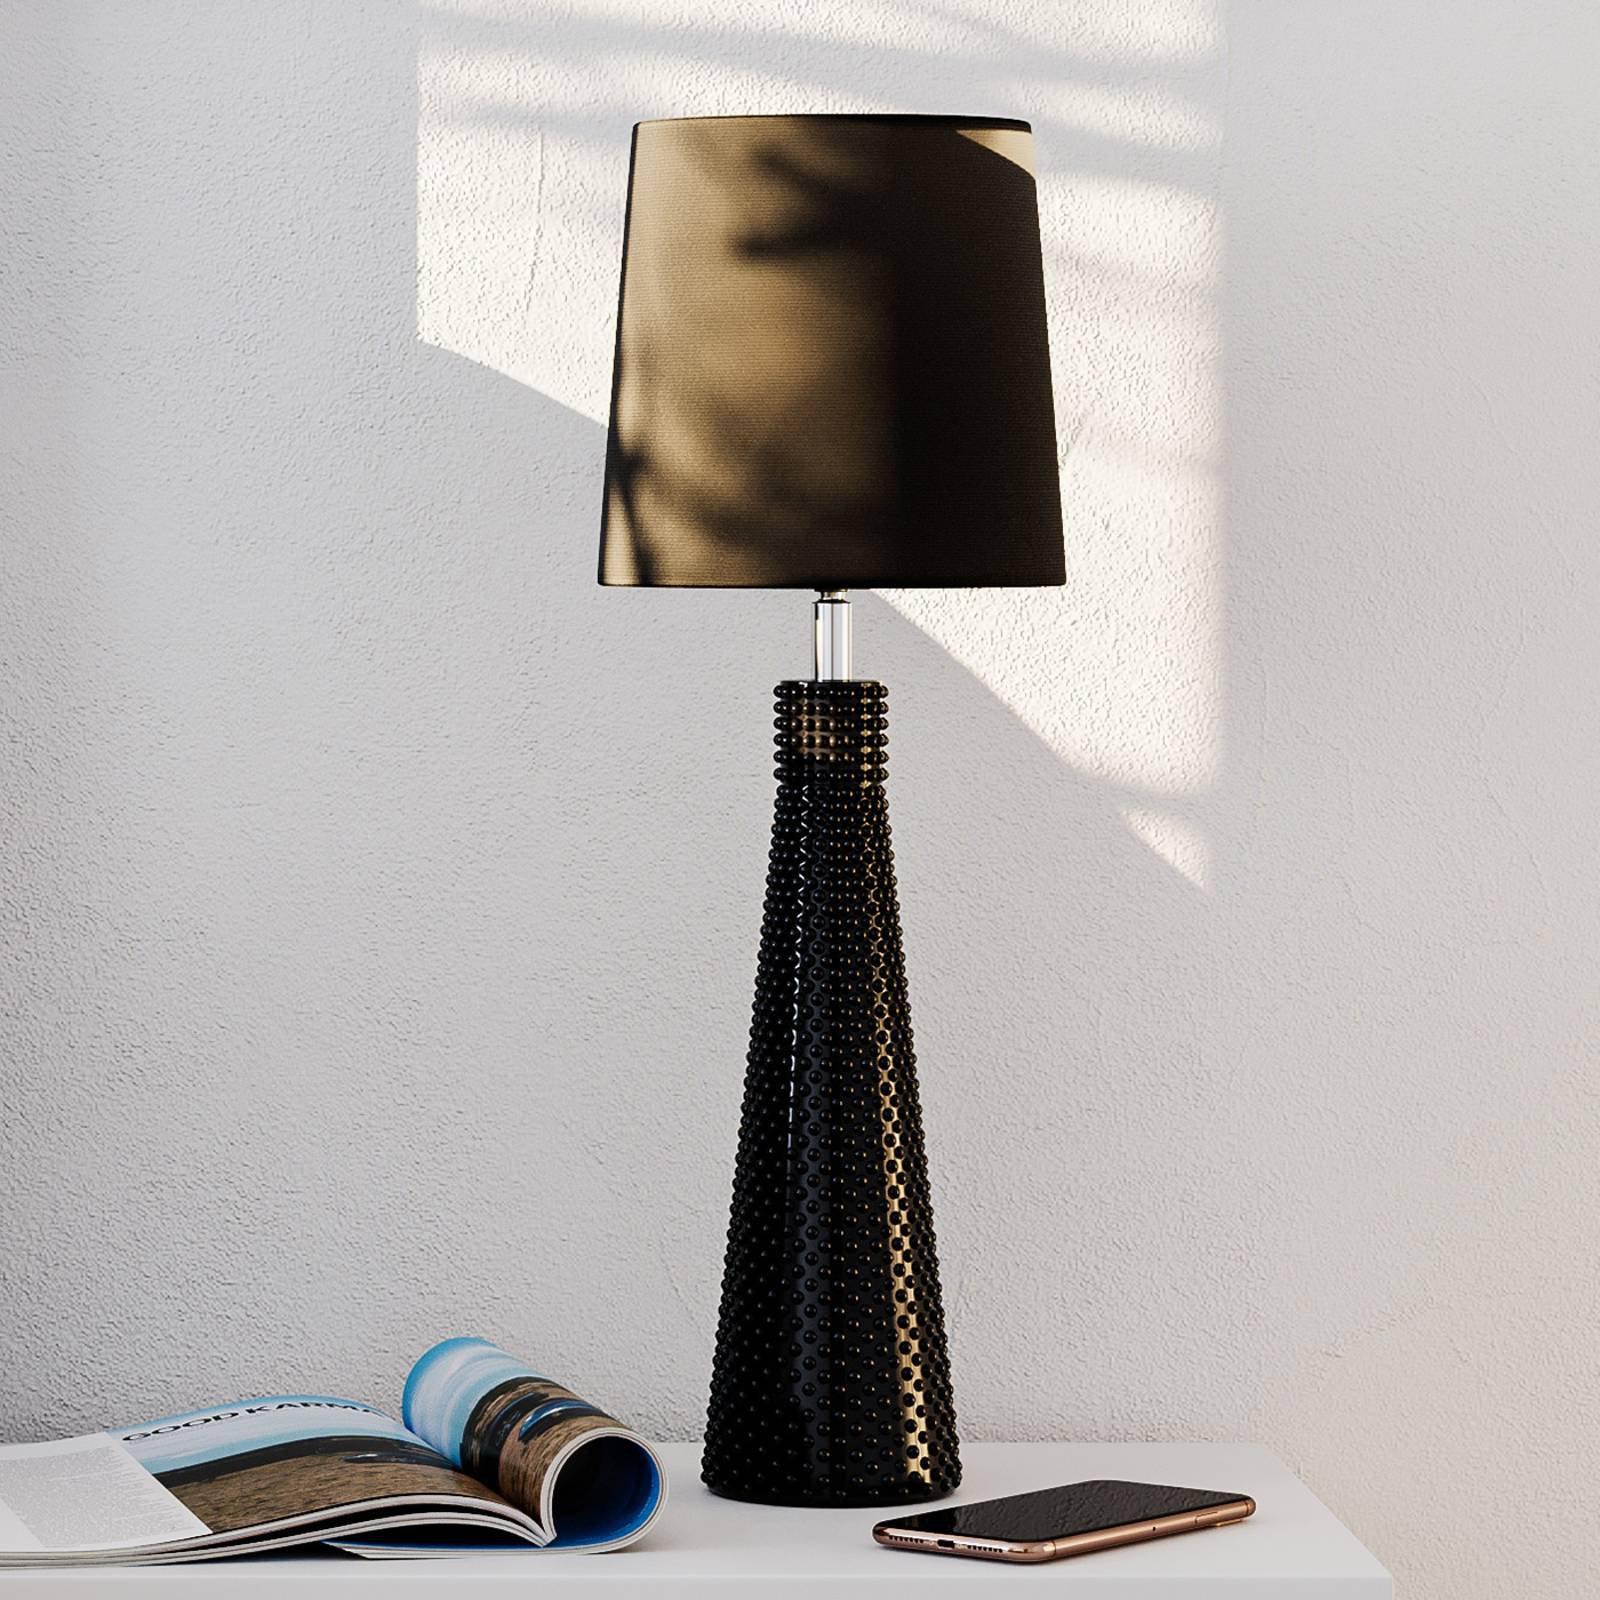 By Rydéns Lofty Slim bordlampe svart